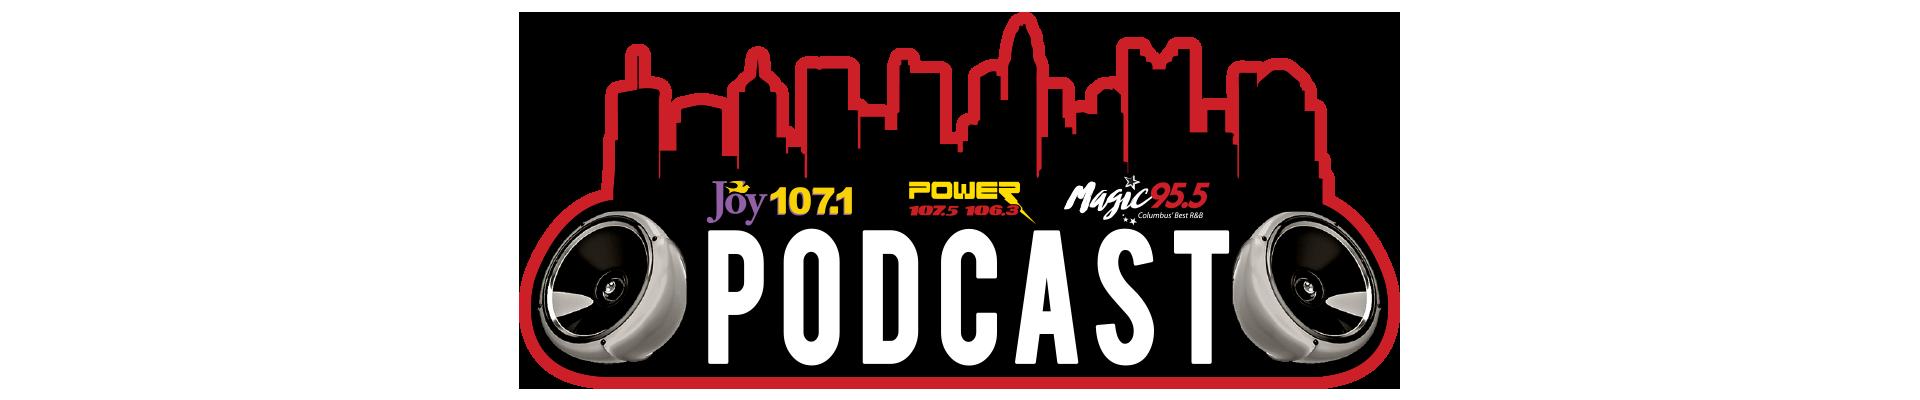 R1 Columbus Podcast Header Copy